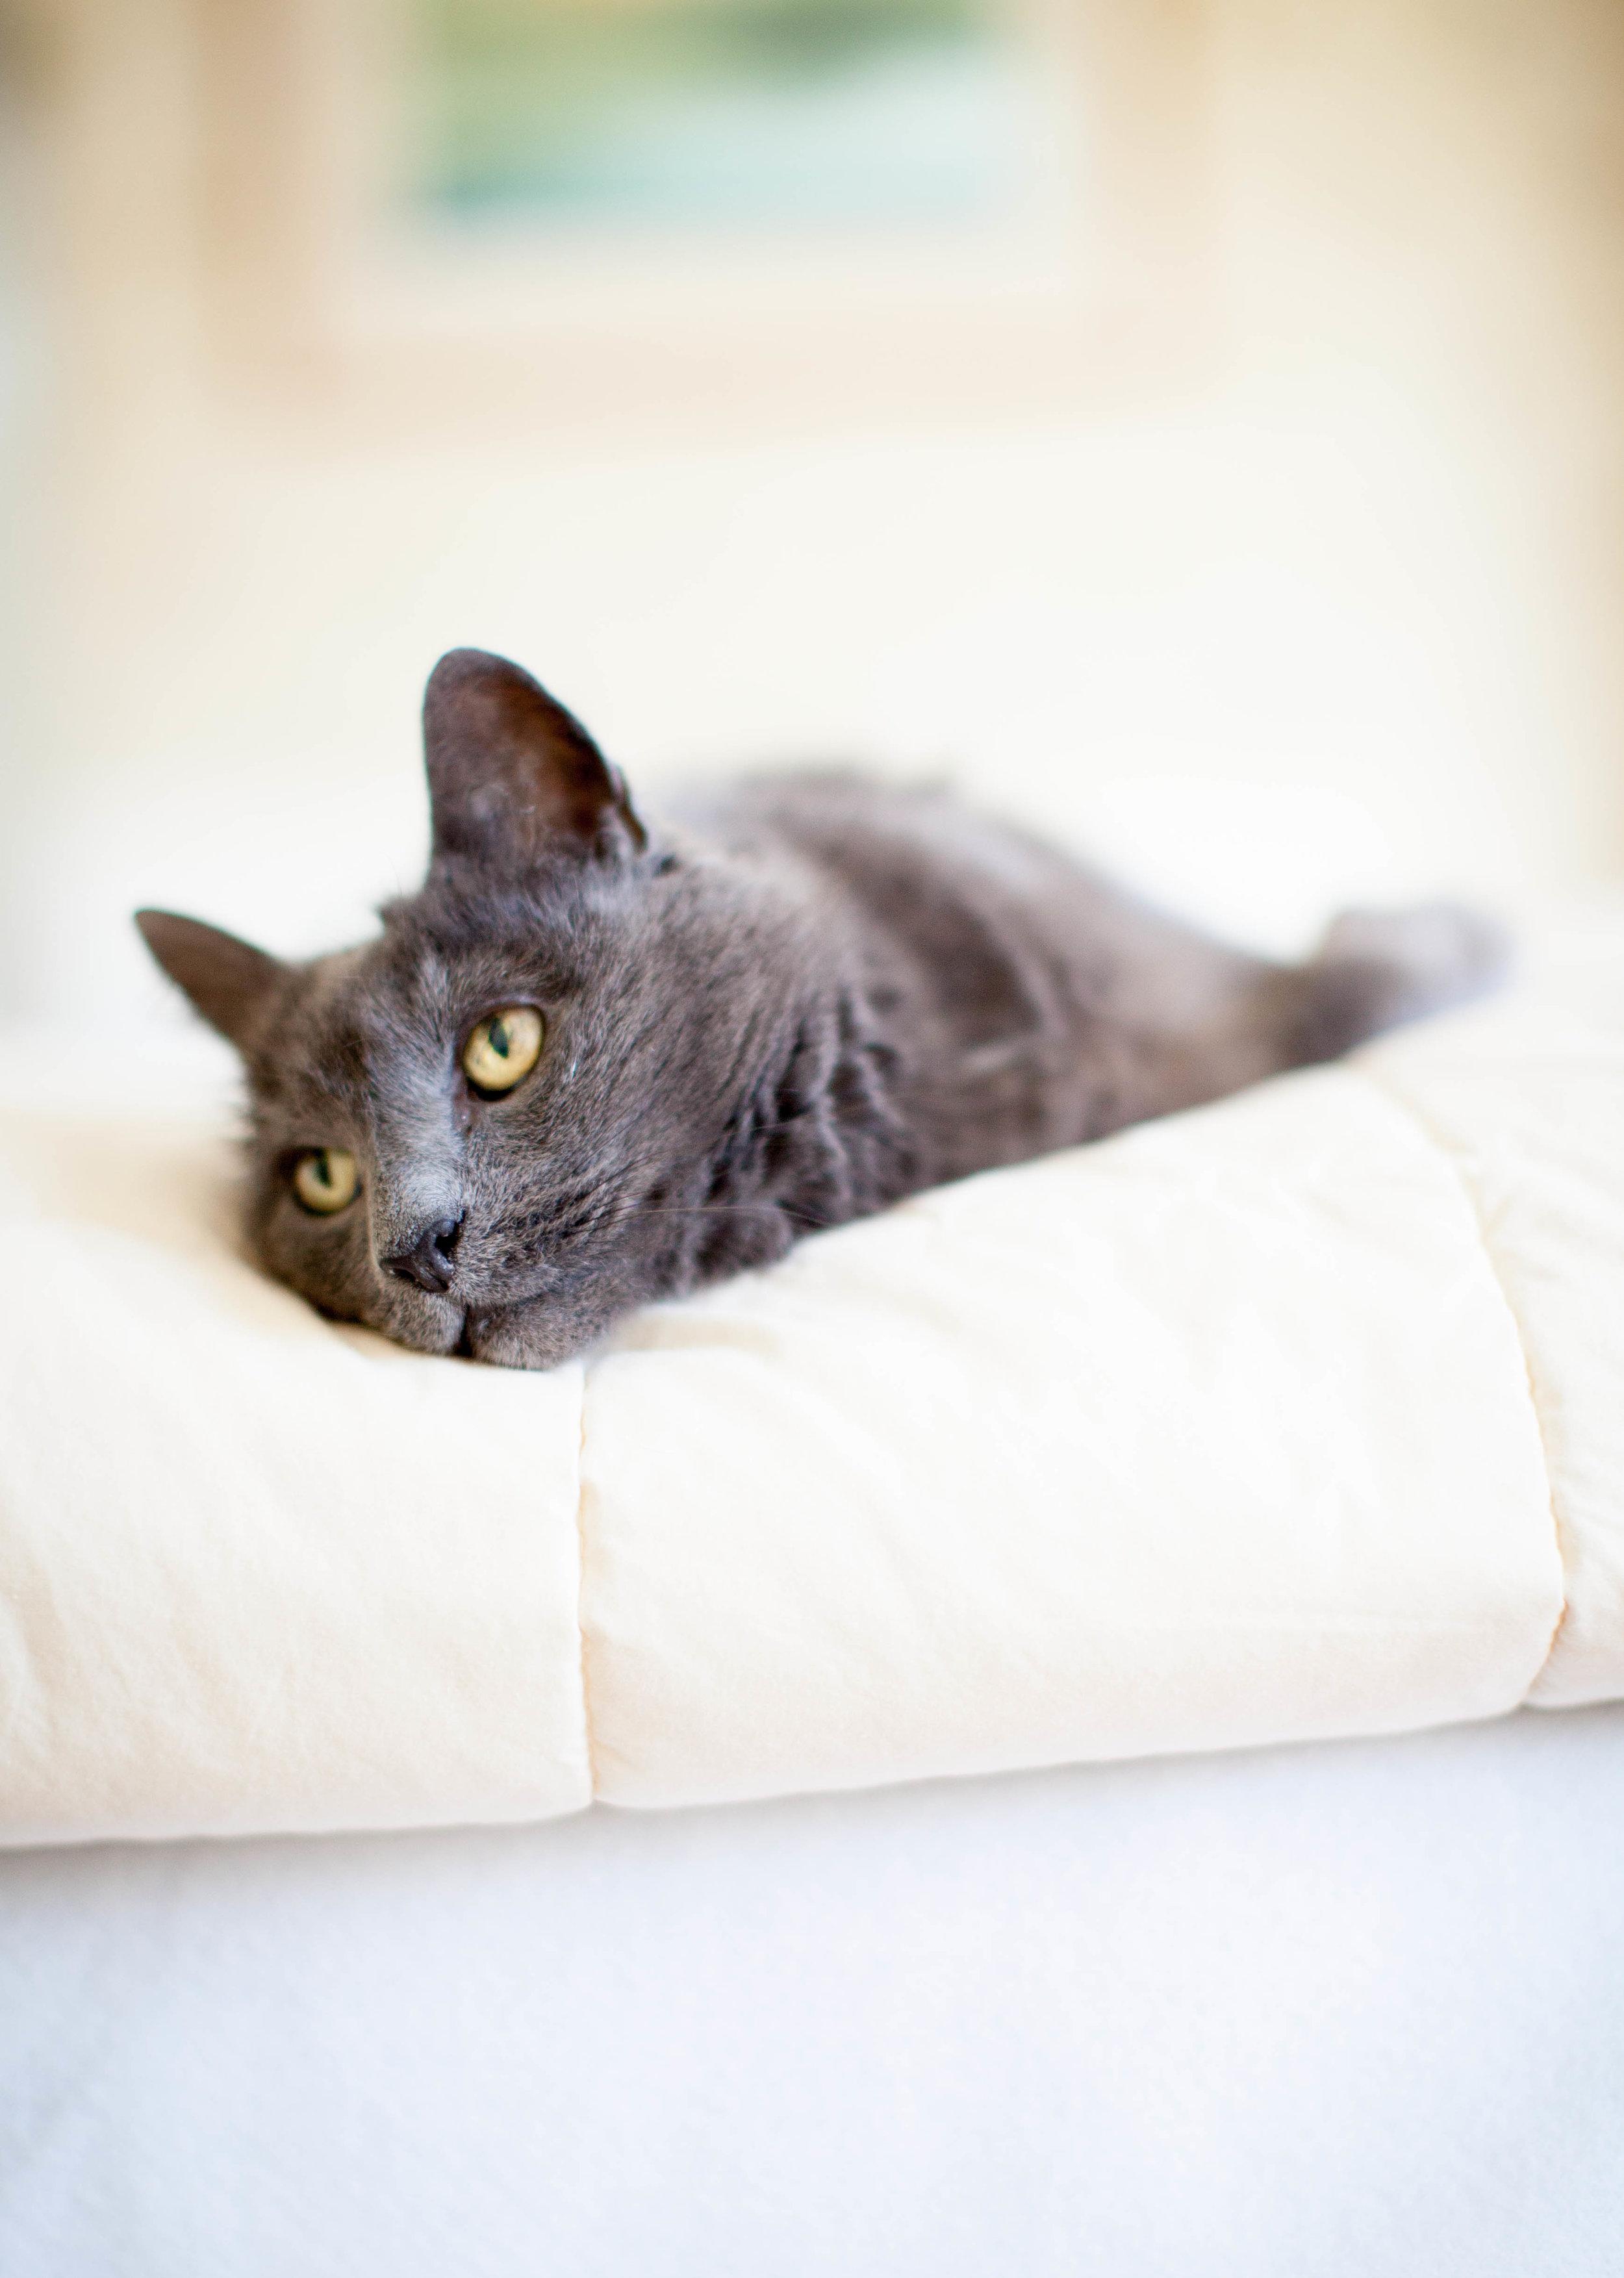 MegaBugPhotography_MooseCountryPetTreats-Cats.jpg